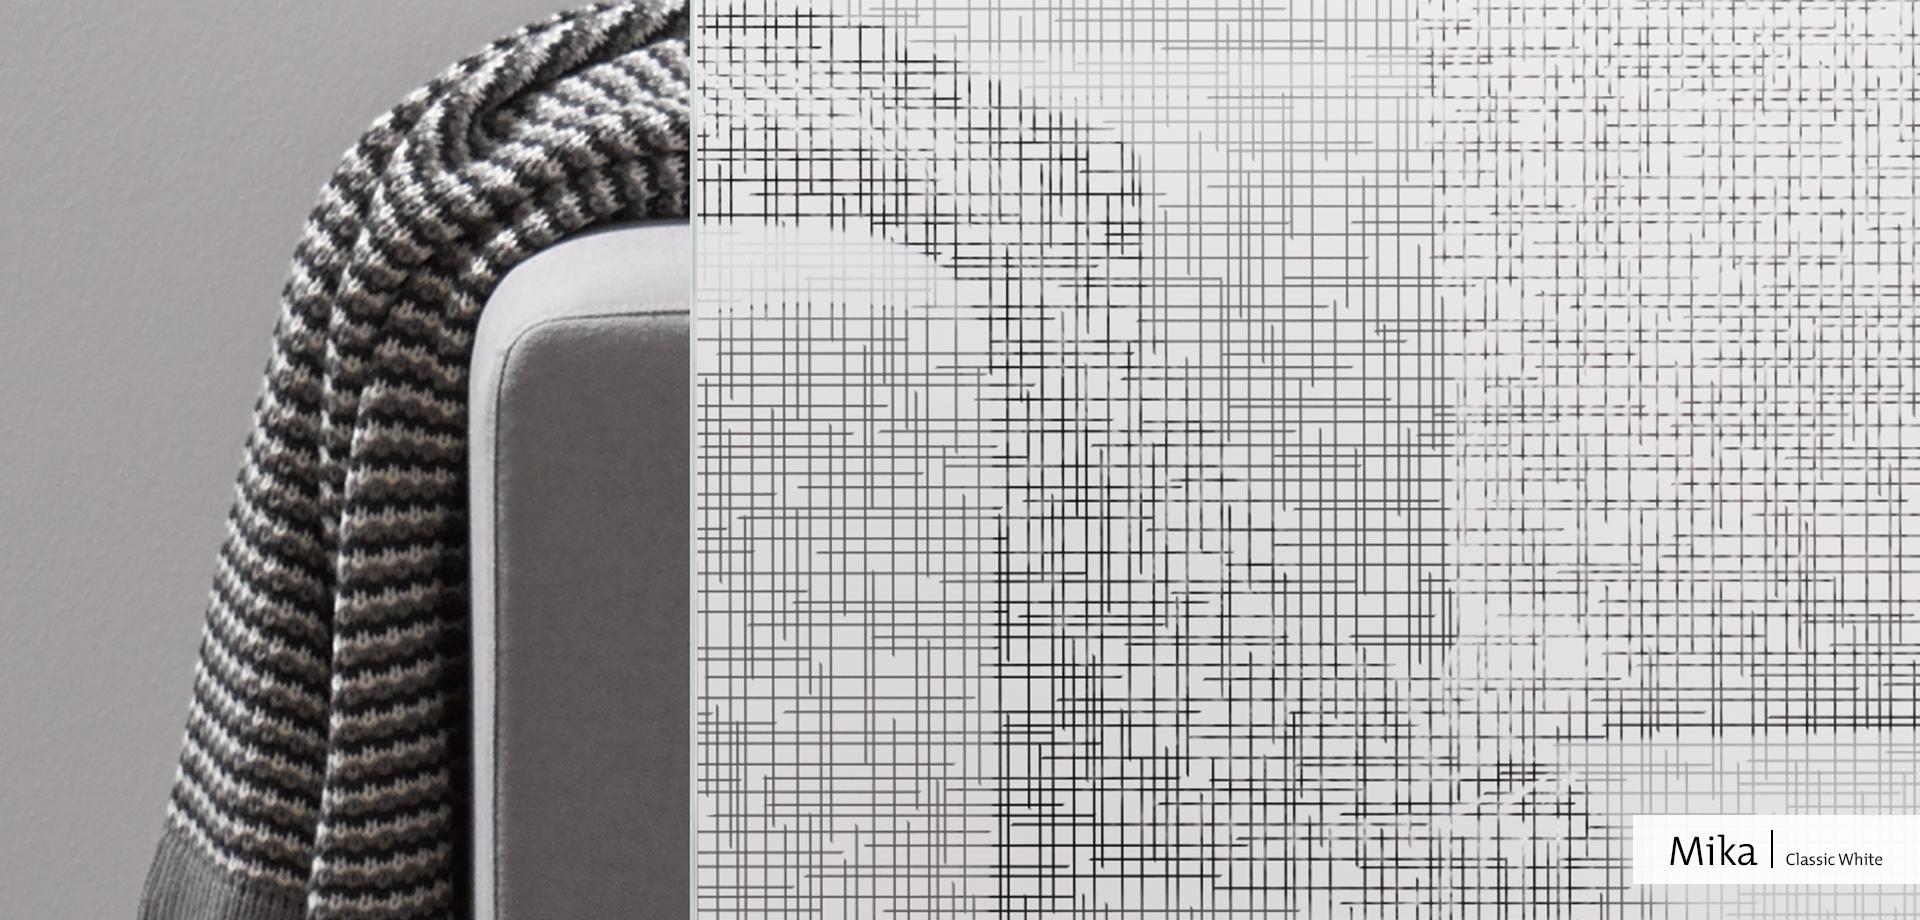 Mika Detail   Classic White